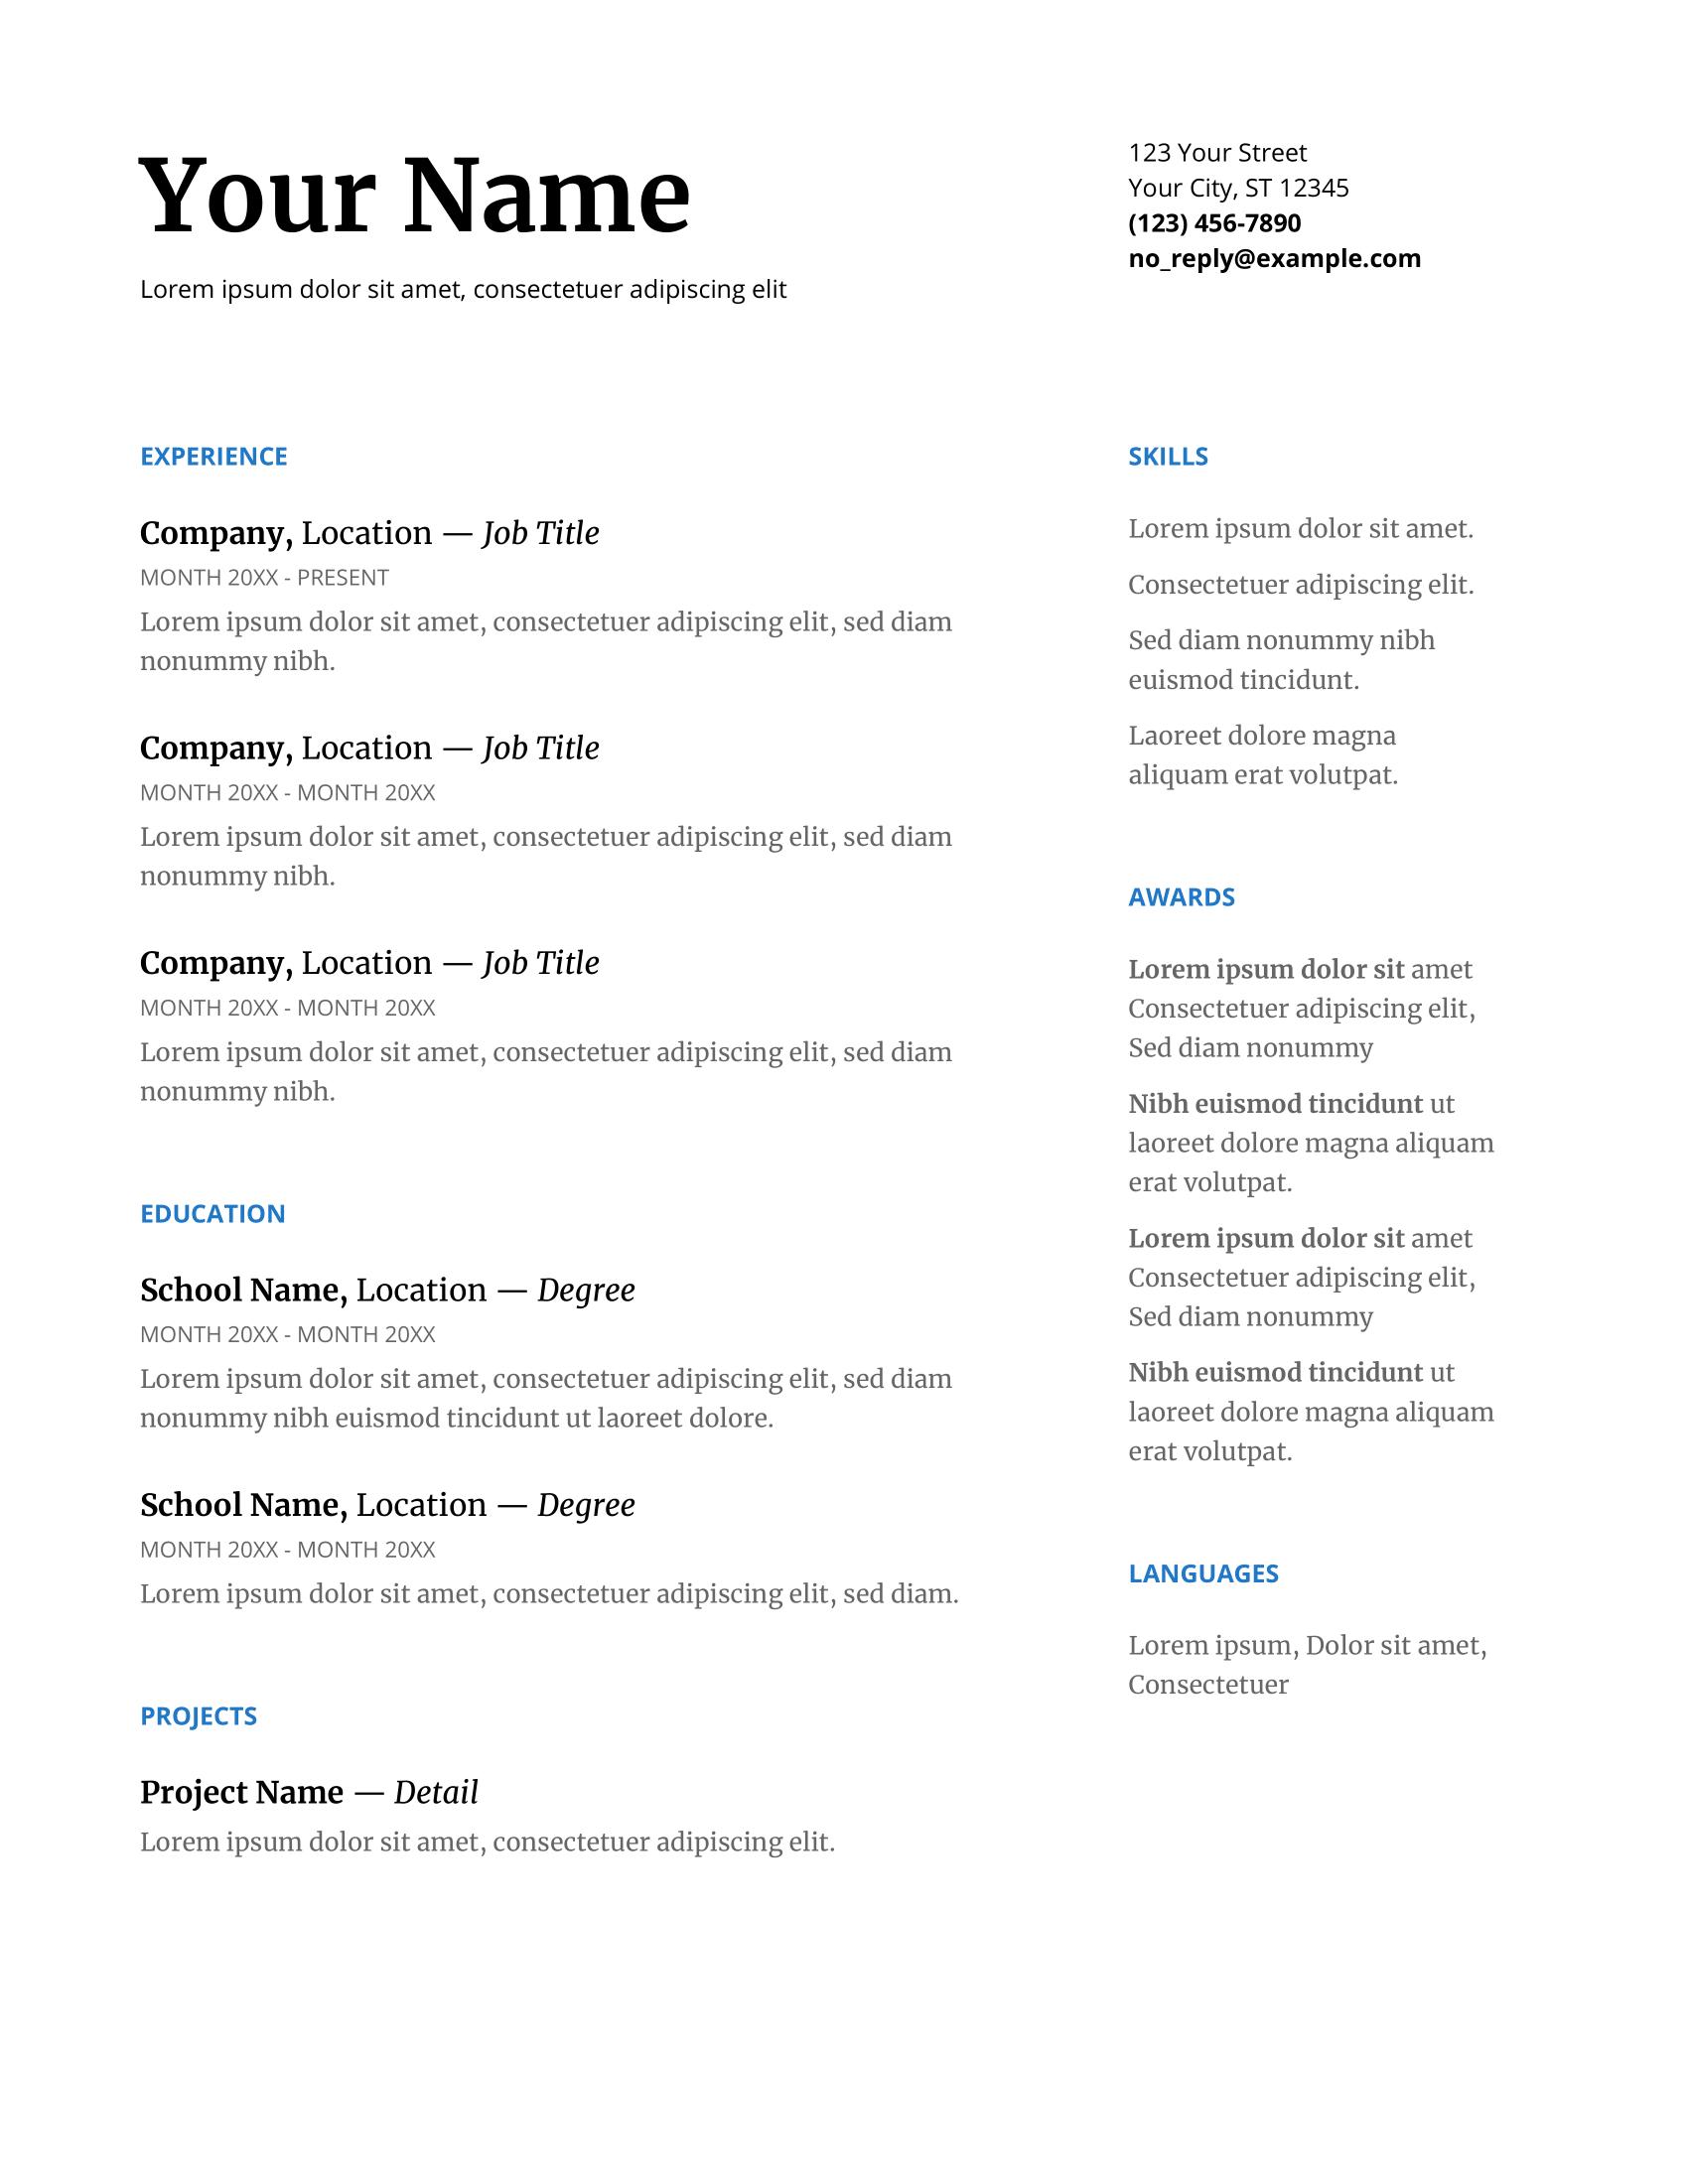 Sample Resume Templates Google Docs in 2020 Downloadable